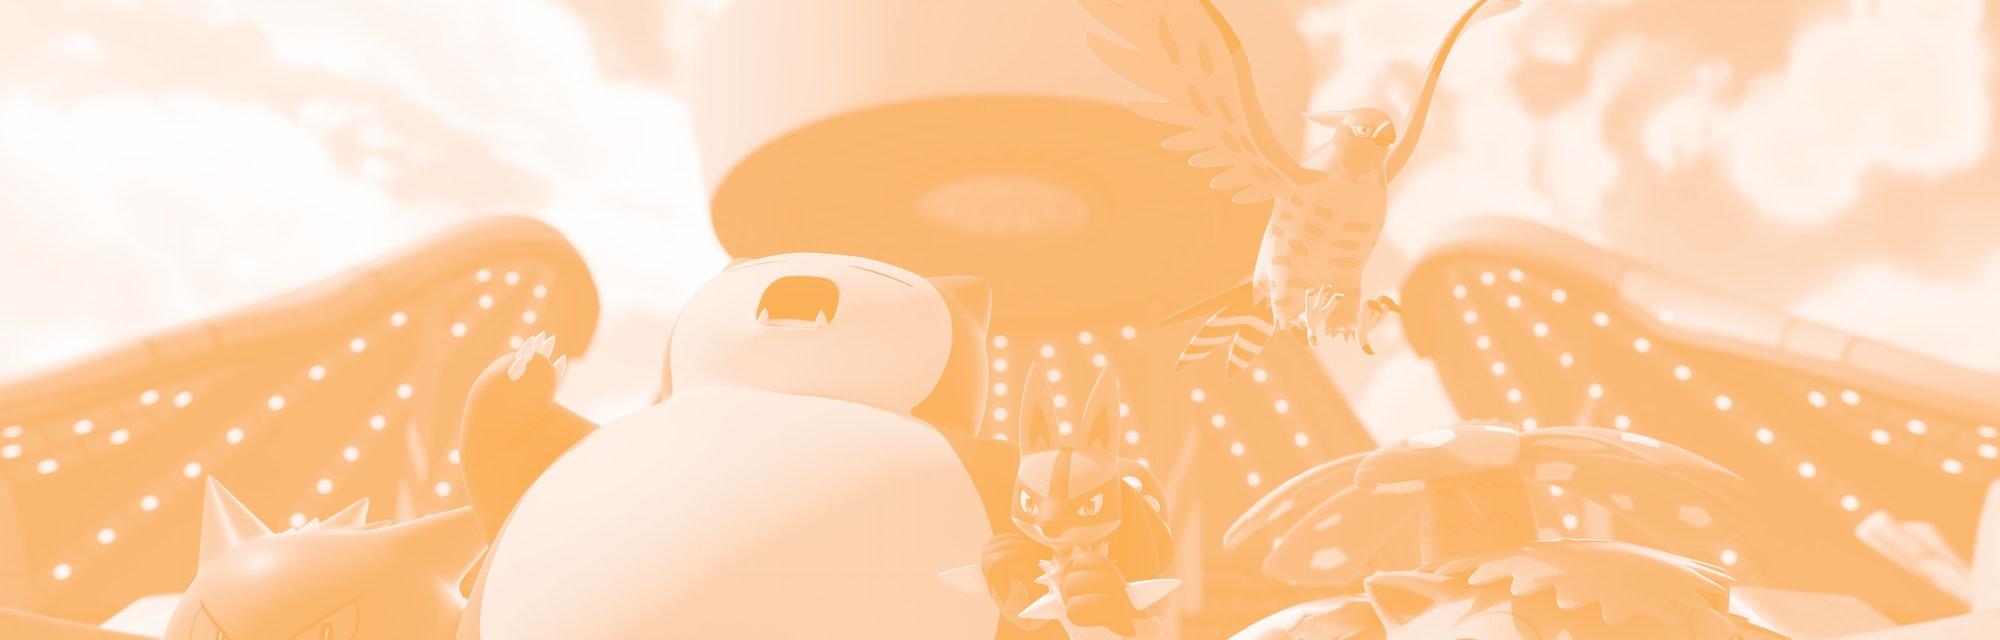 pokemon unite team takedown screenshot